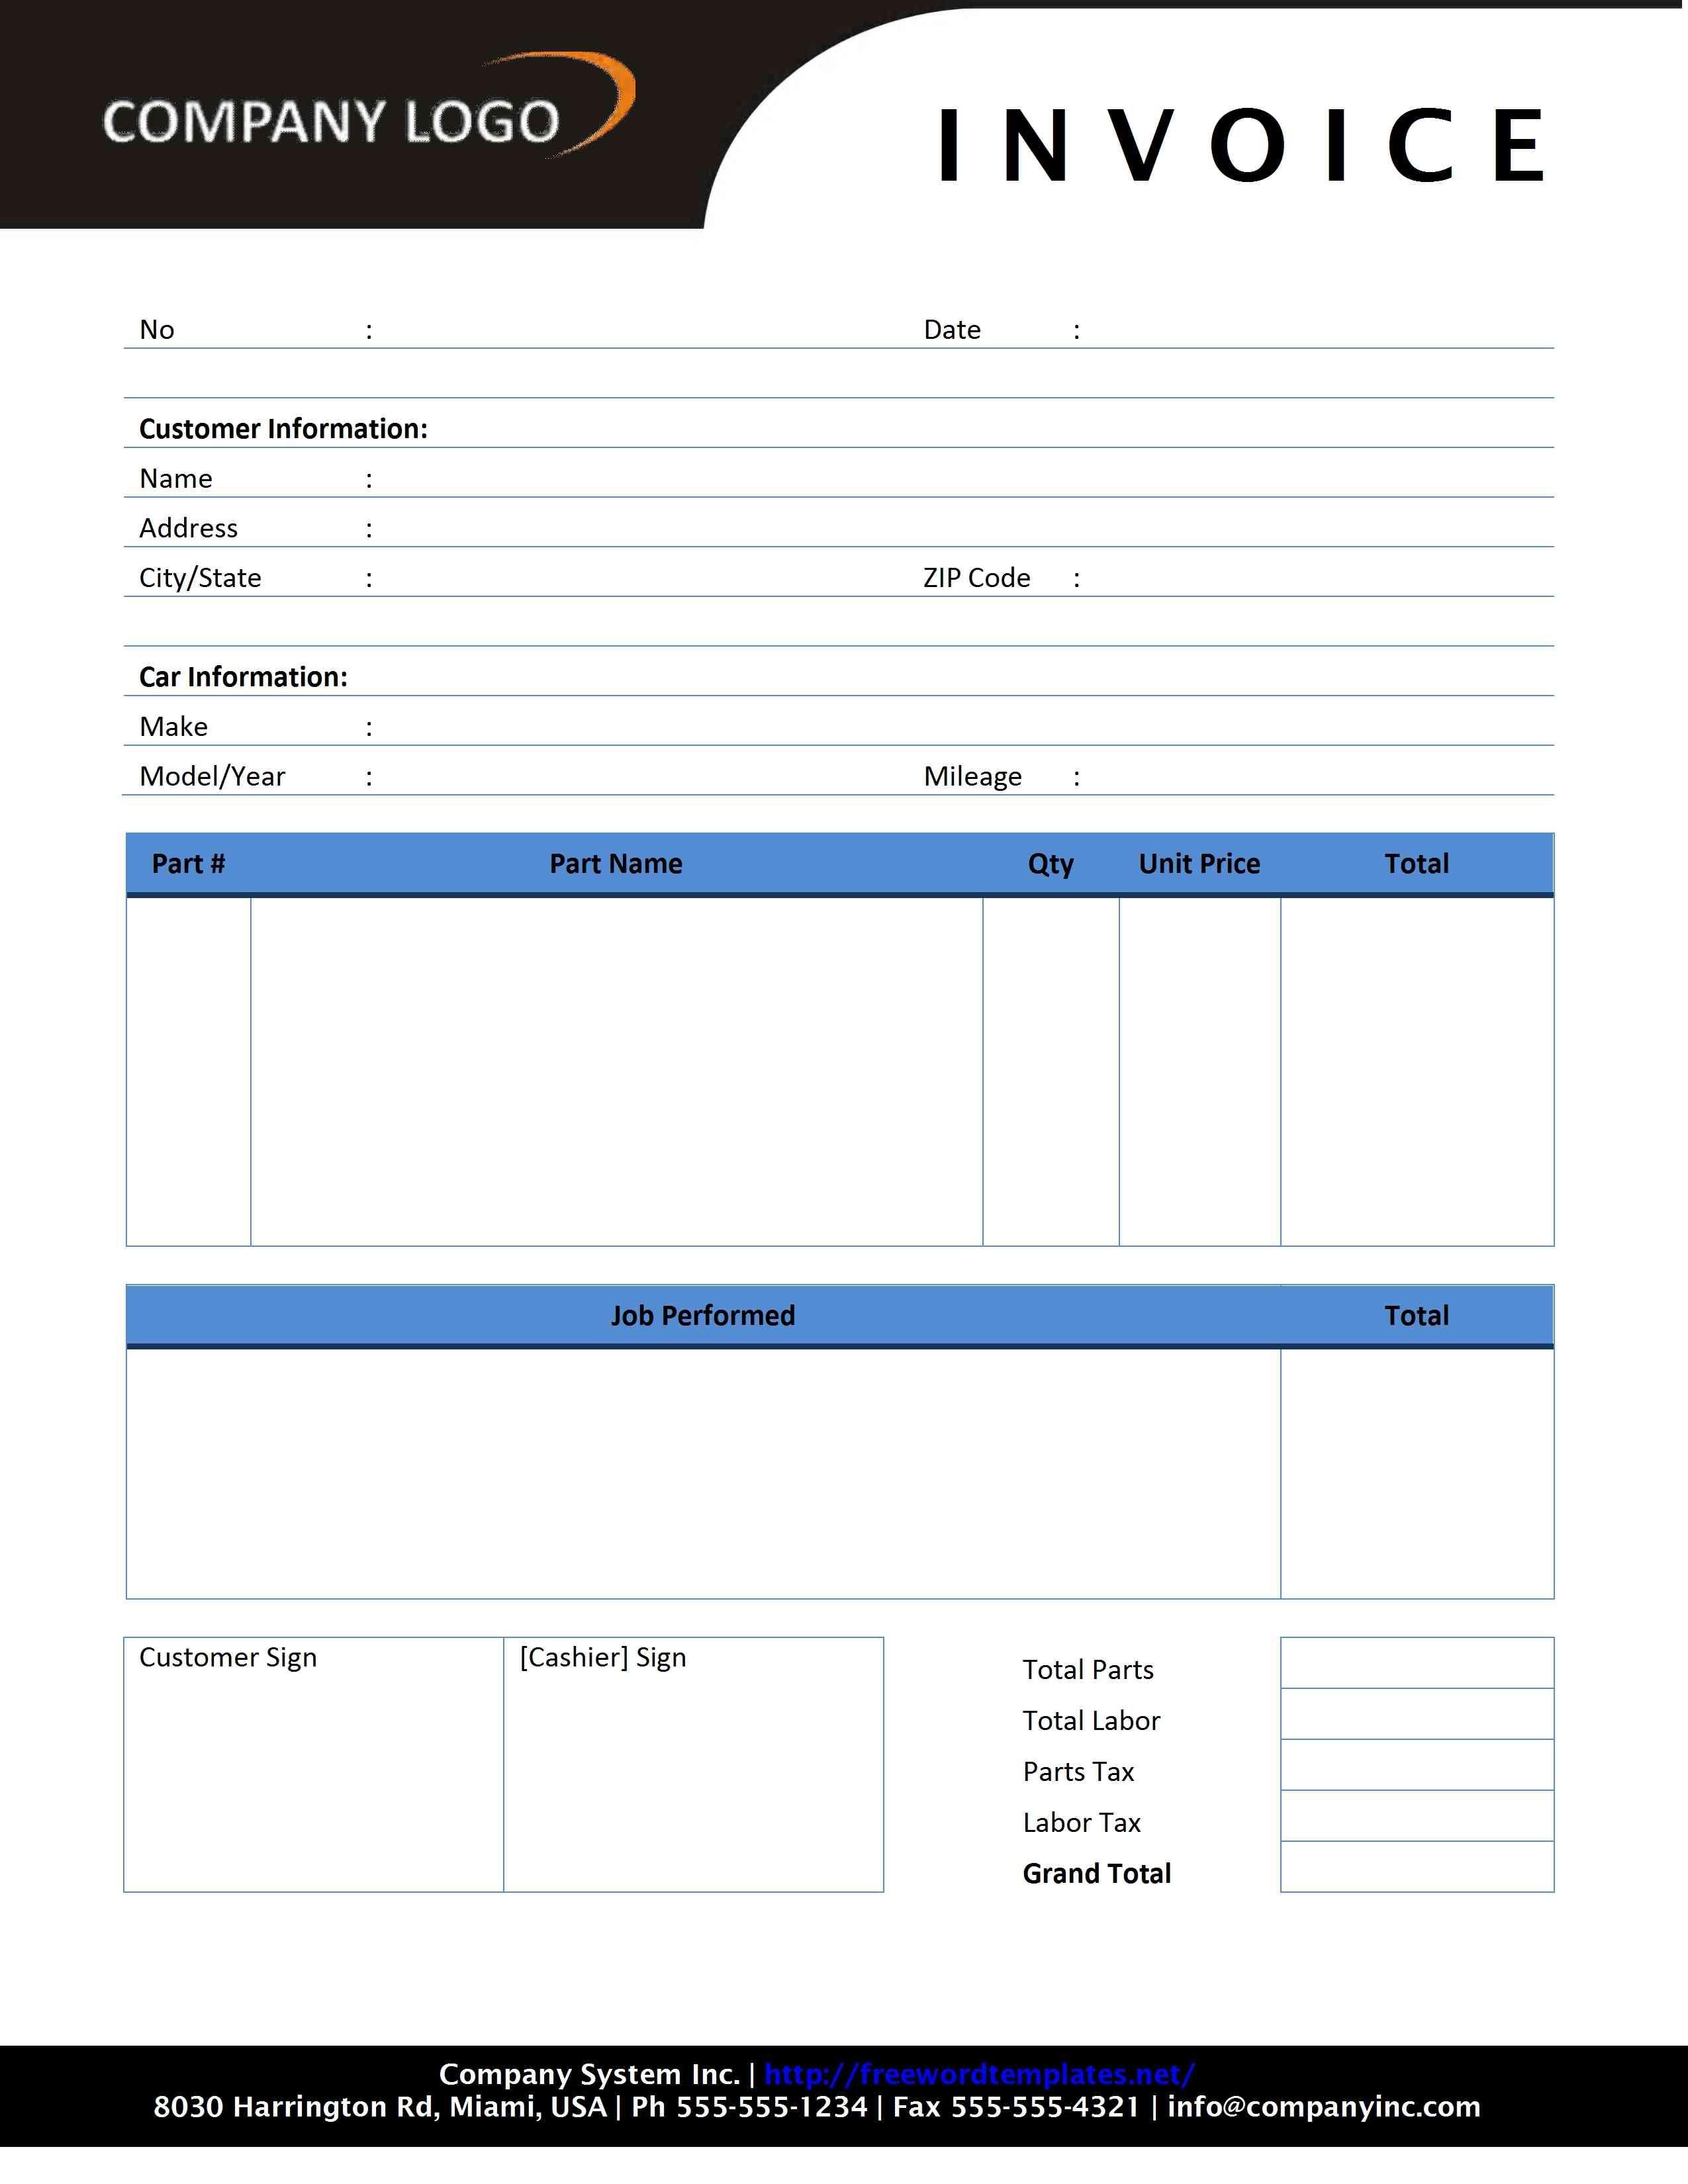 auto repair invoices auto repair invoice template free microsoft word templates 2550 X 3300